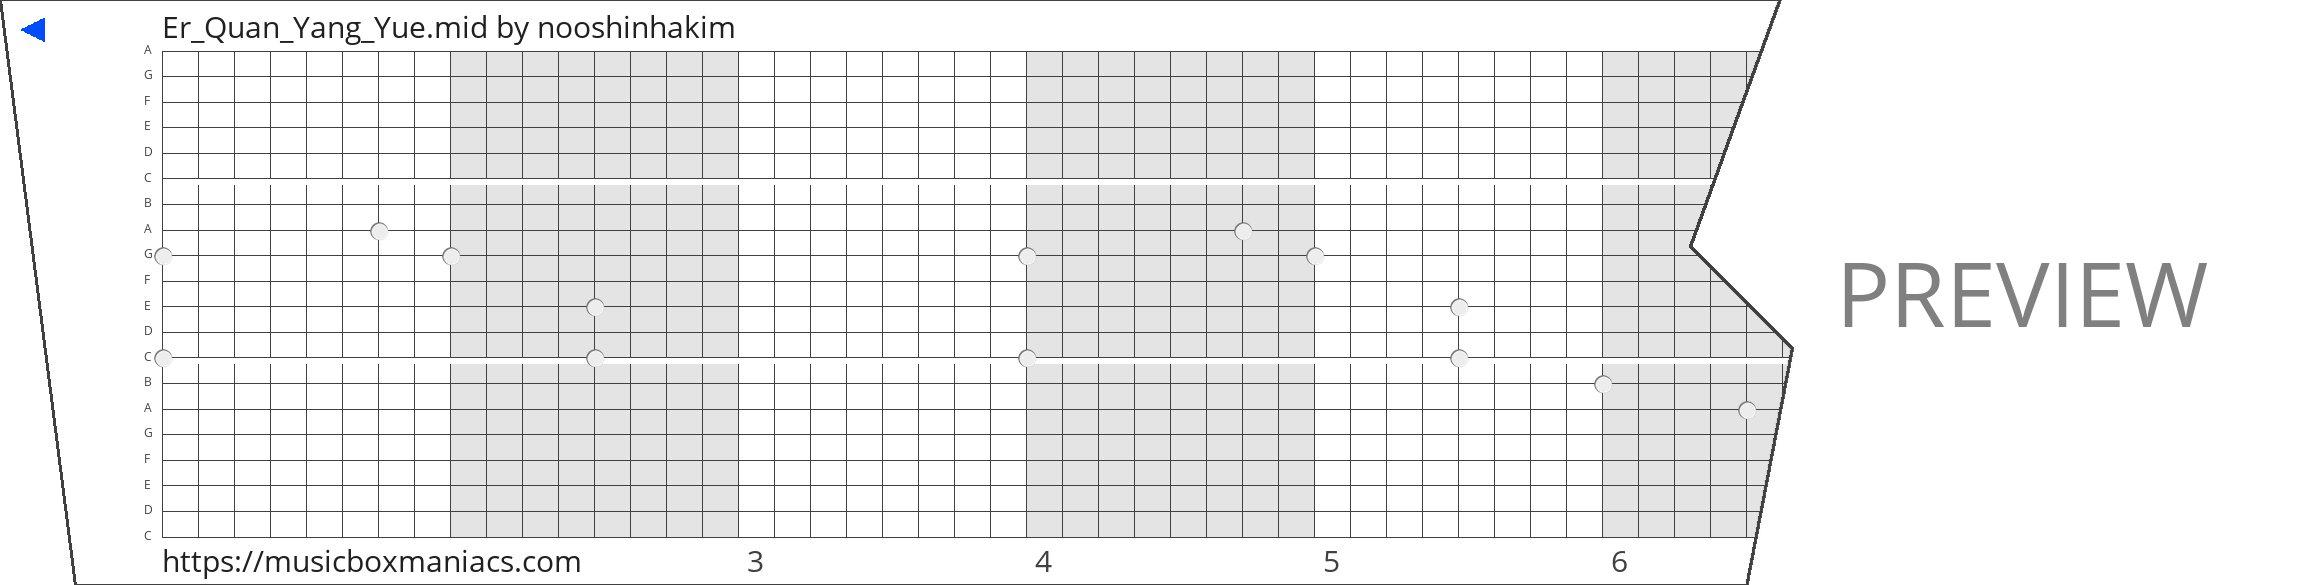 Er_Quan_Yang_Yue.mid 20 note music box paper strip